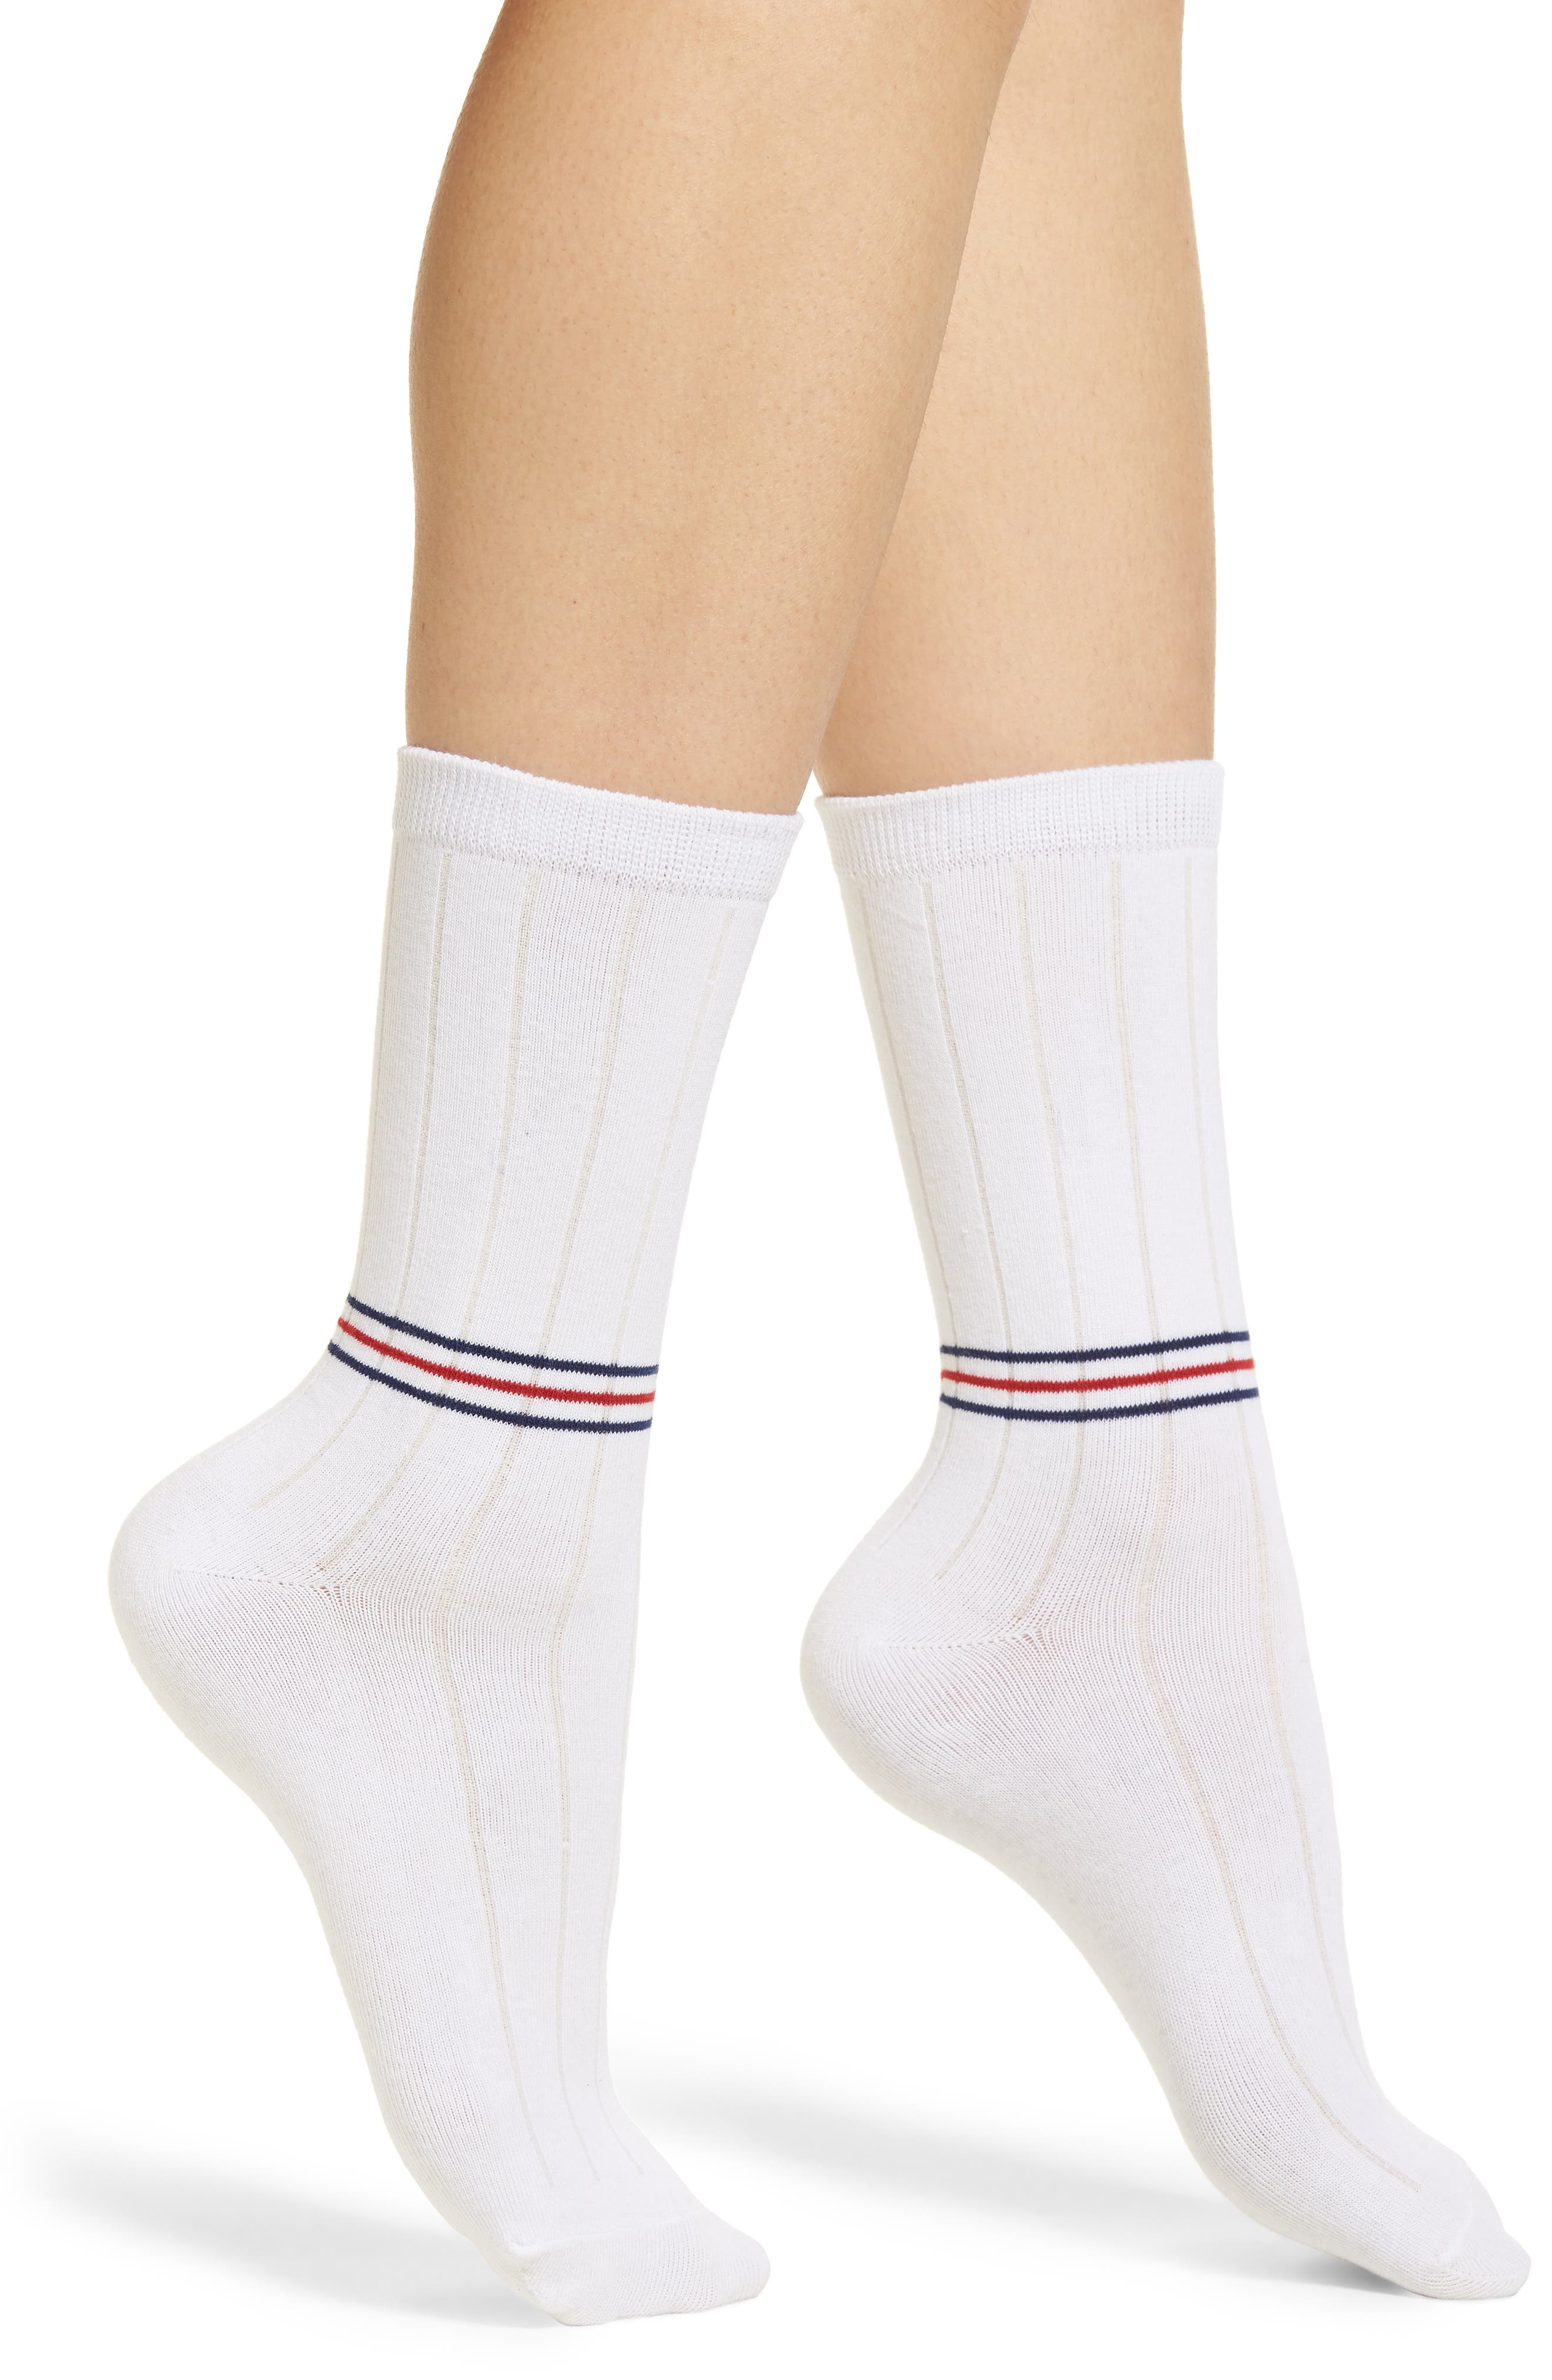 Rocky Classic Crew Socks,                             Main thumbnail 1, color,                             White